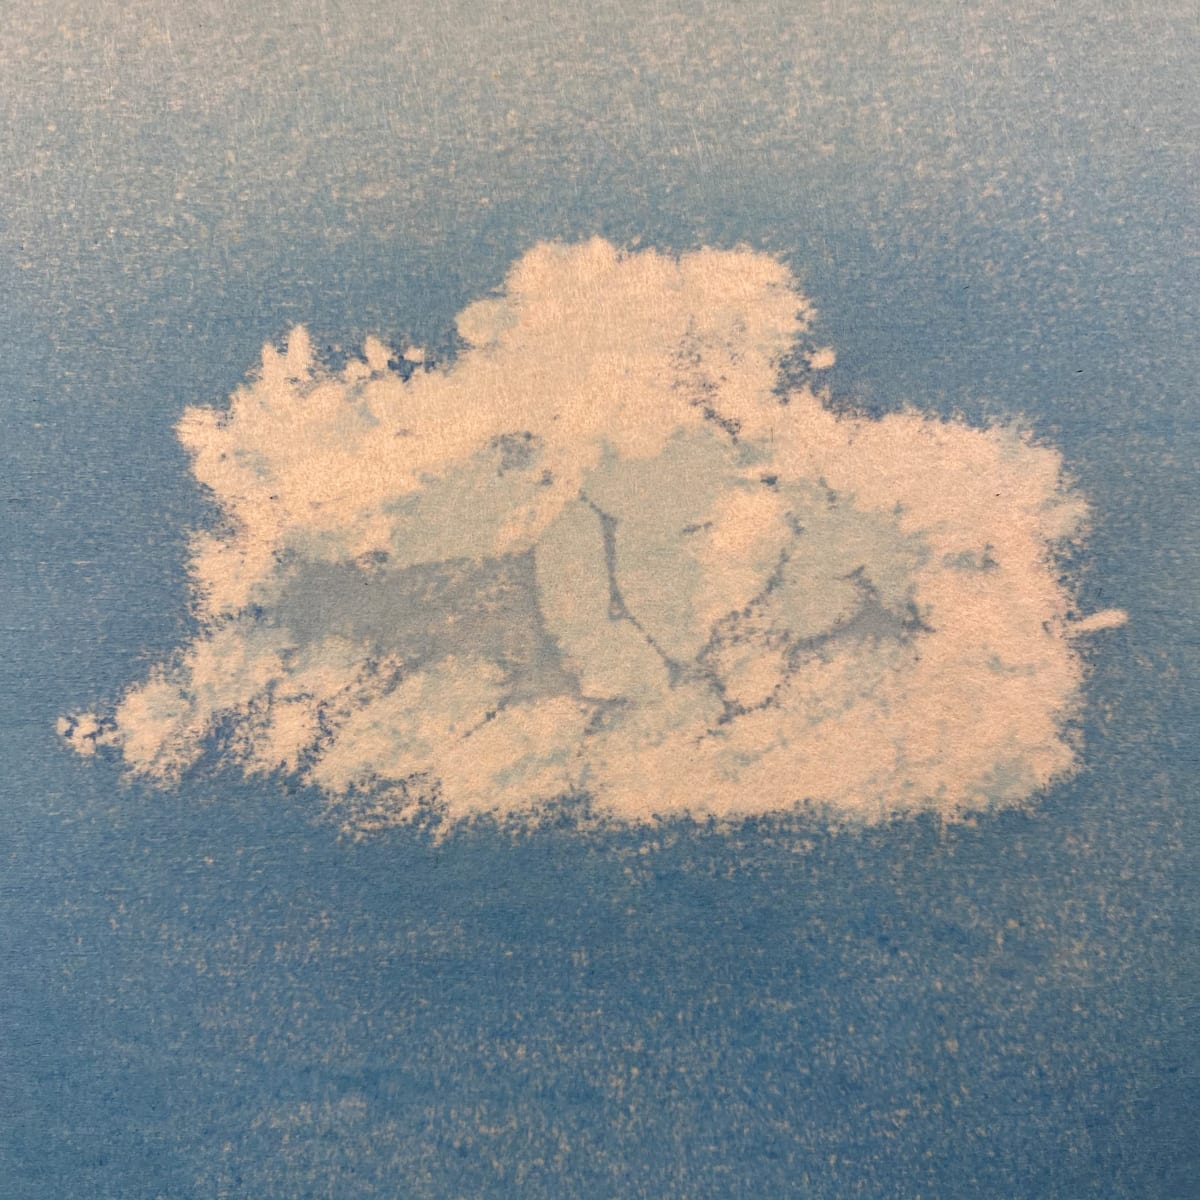 Silver lining #2 by Mara Cozzolino